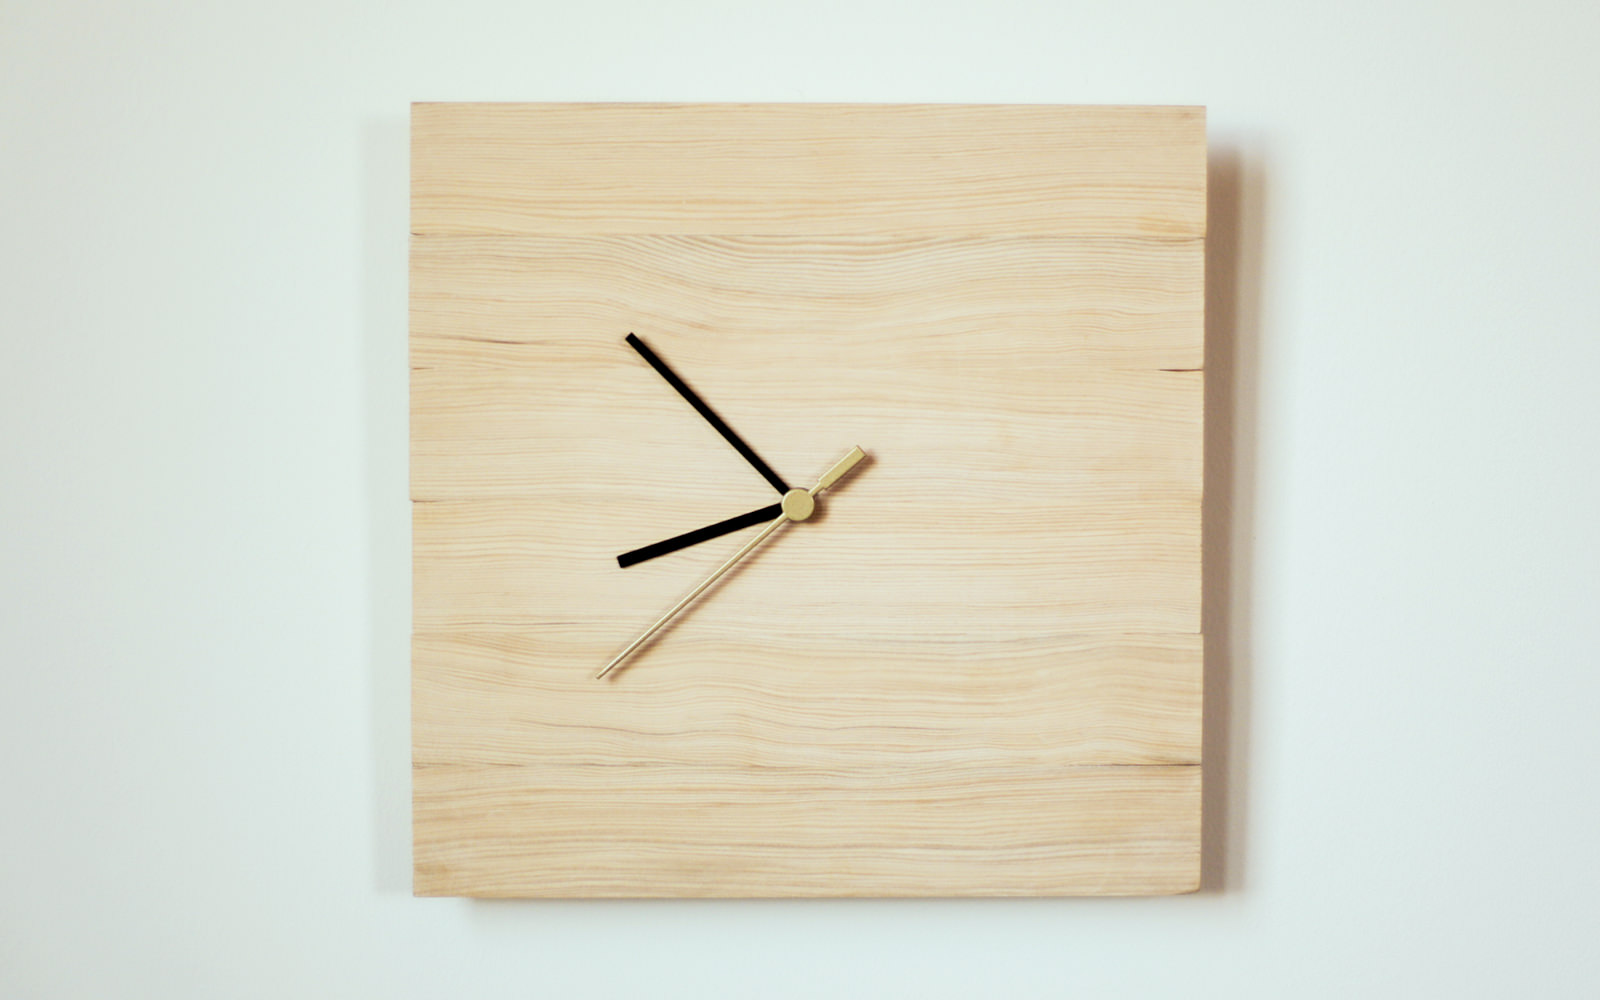 Ikea clock hack how to make your own idea clock dunn diy for Ikea renton hours